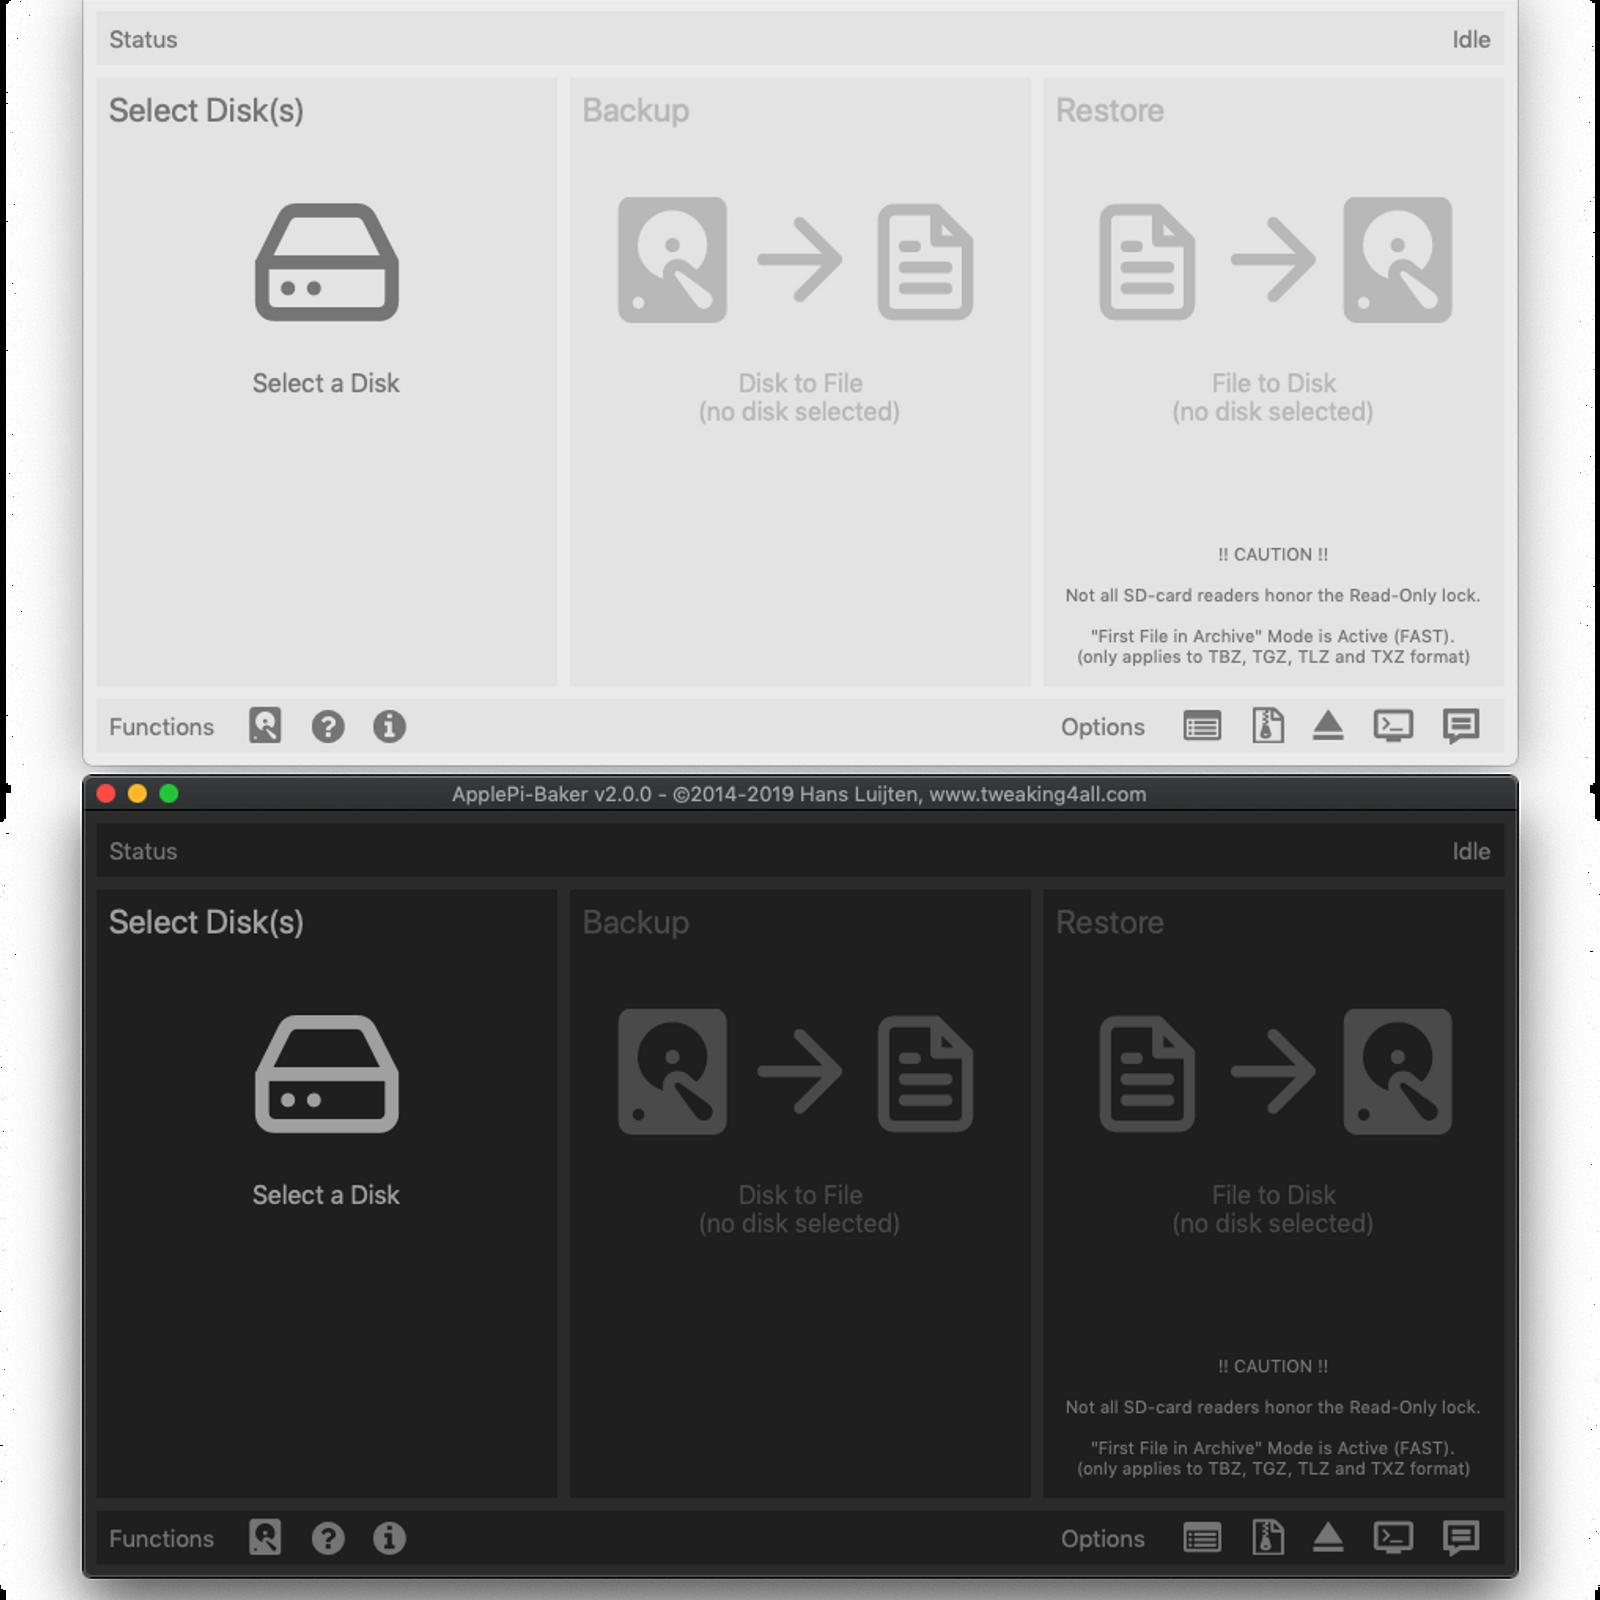 ApplePi-Baker v2 Alternatives and Similar Software